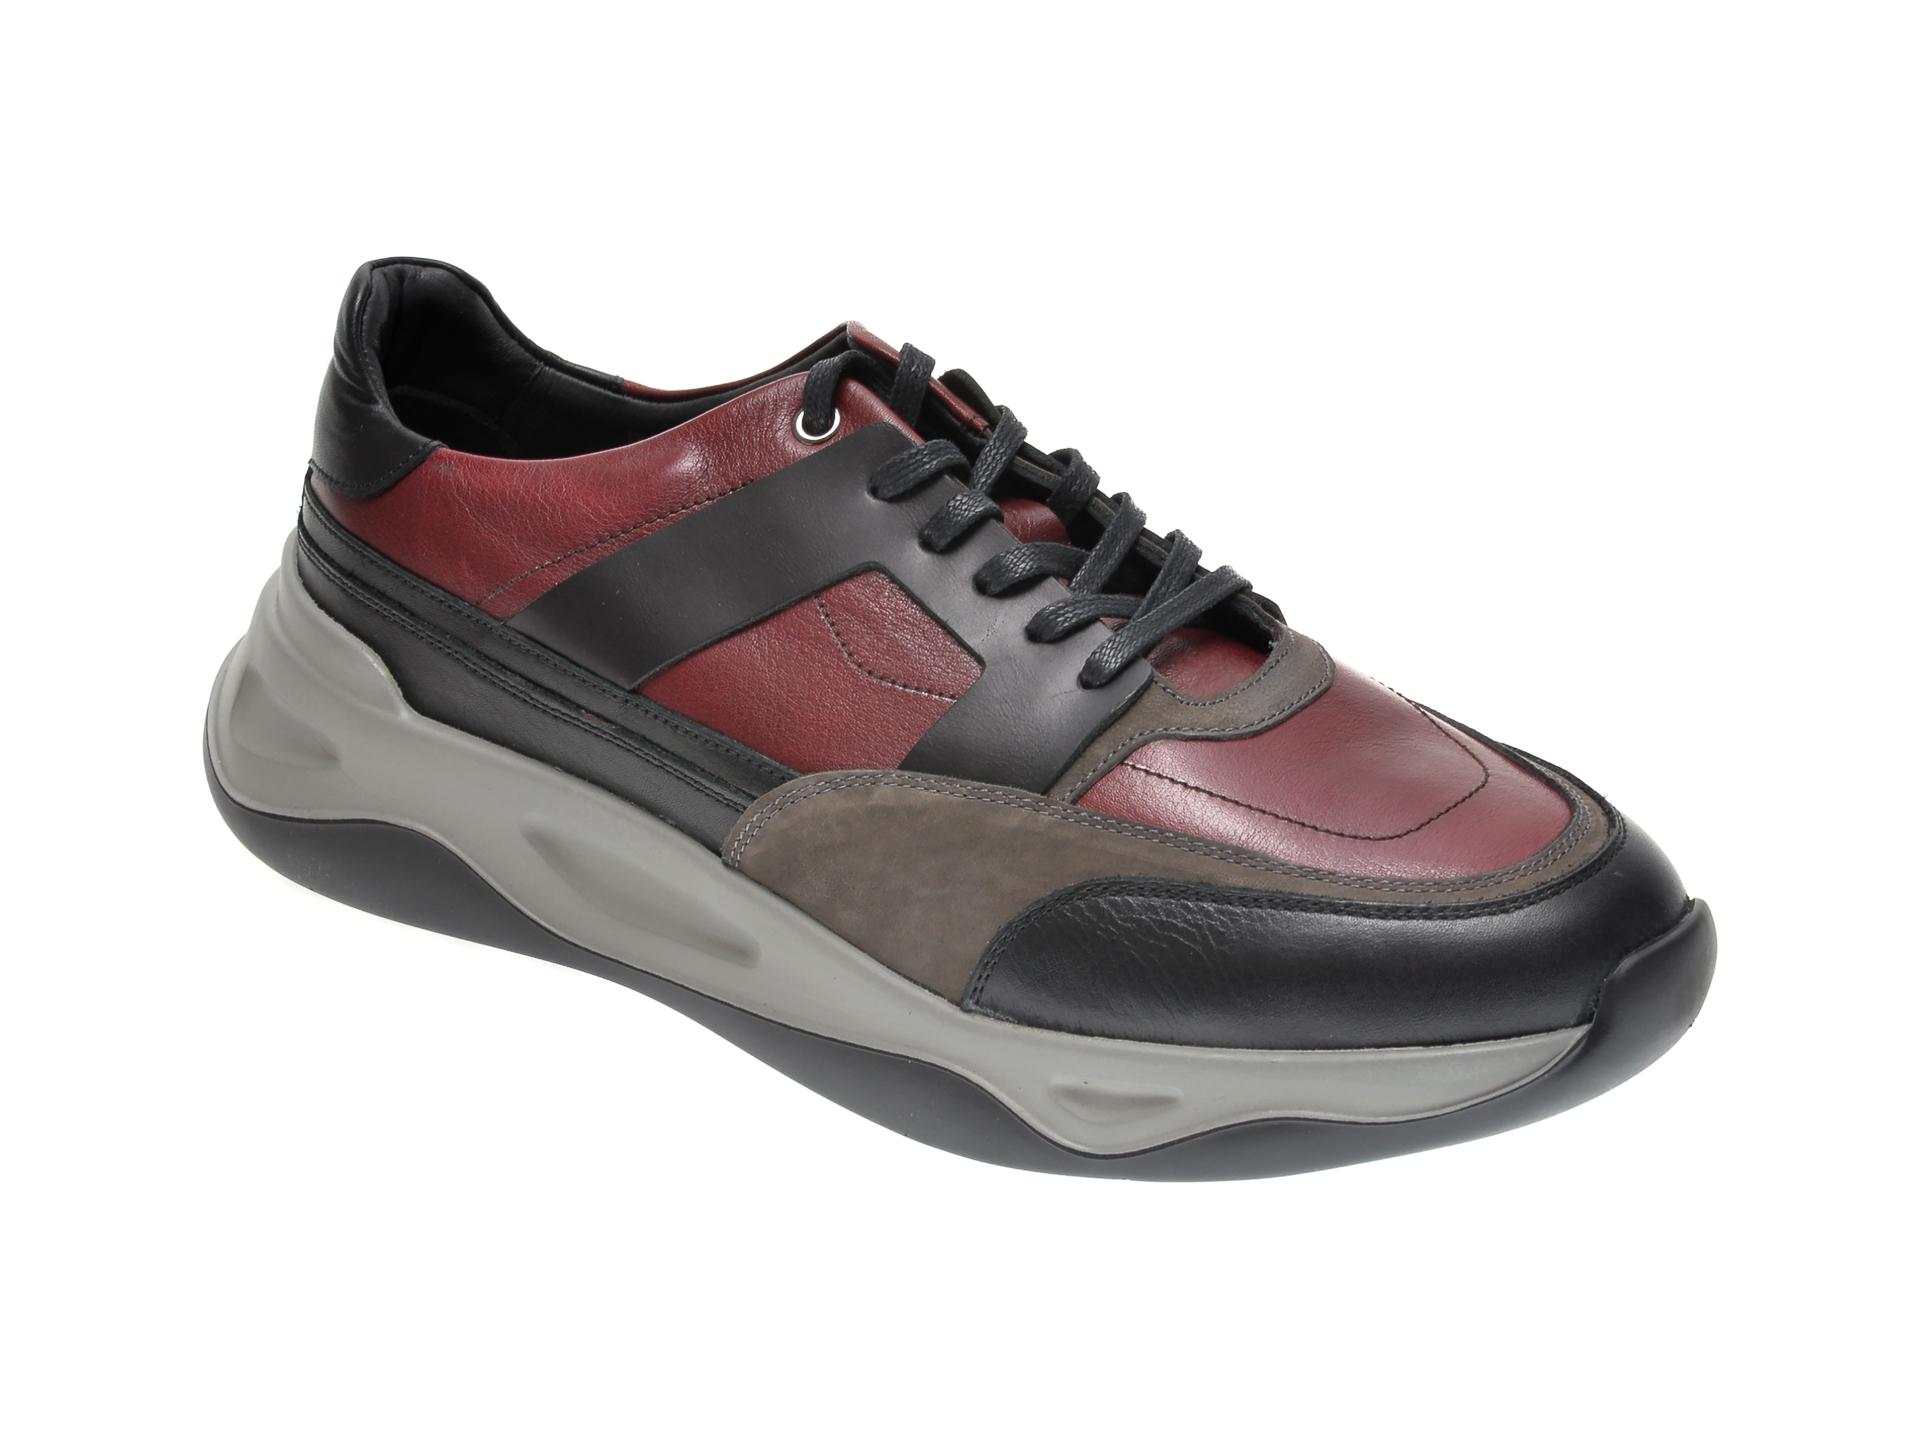 Pantofi OTTER negri, 616, din piele naturala imagine